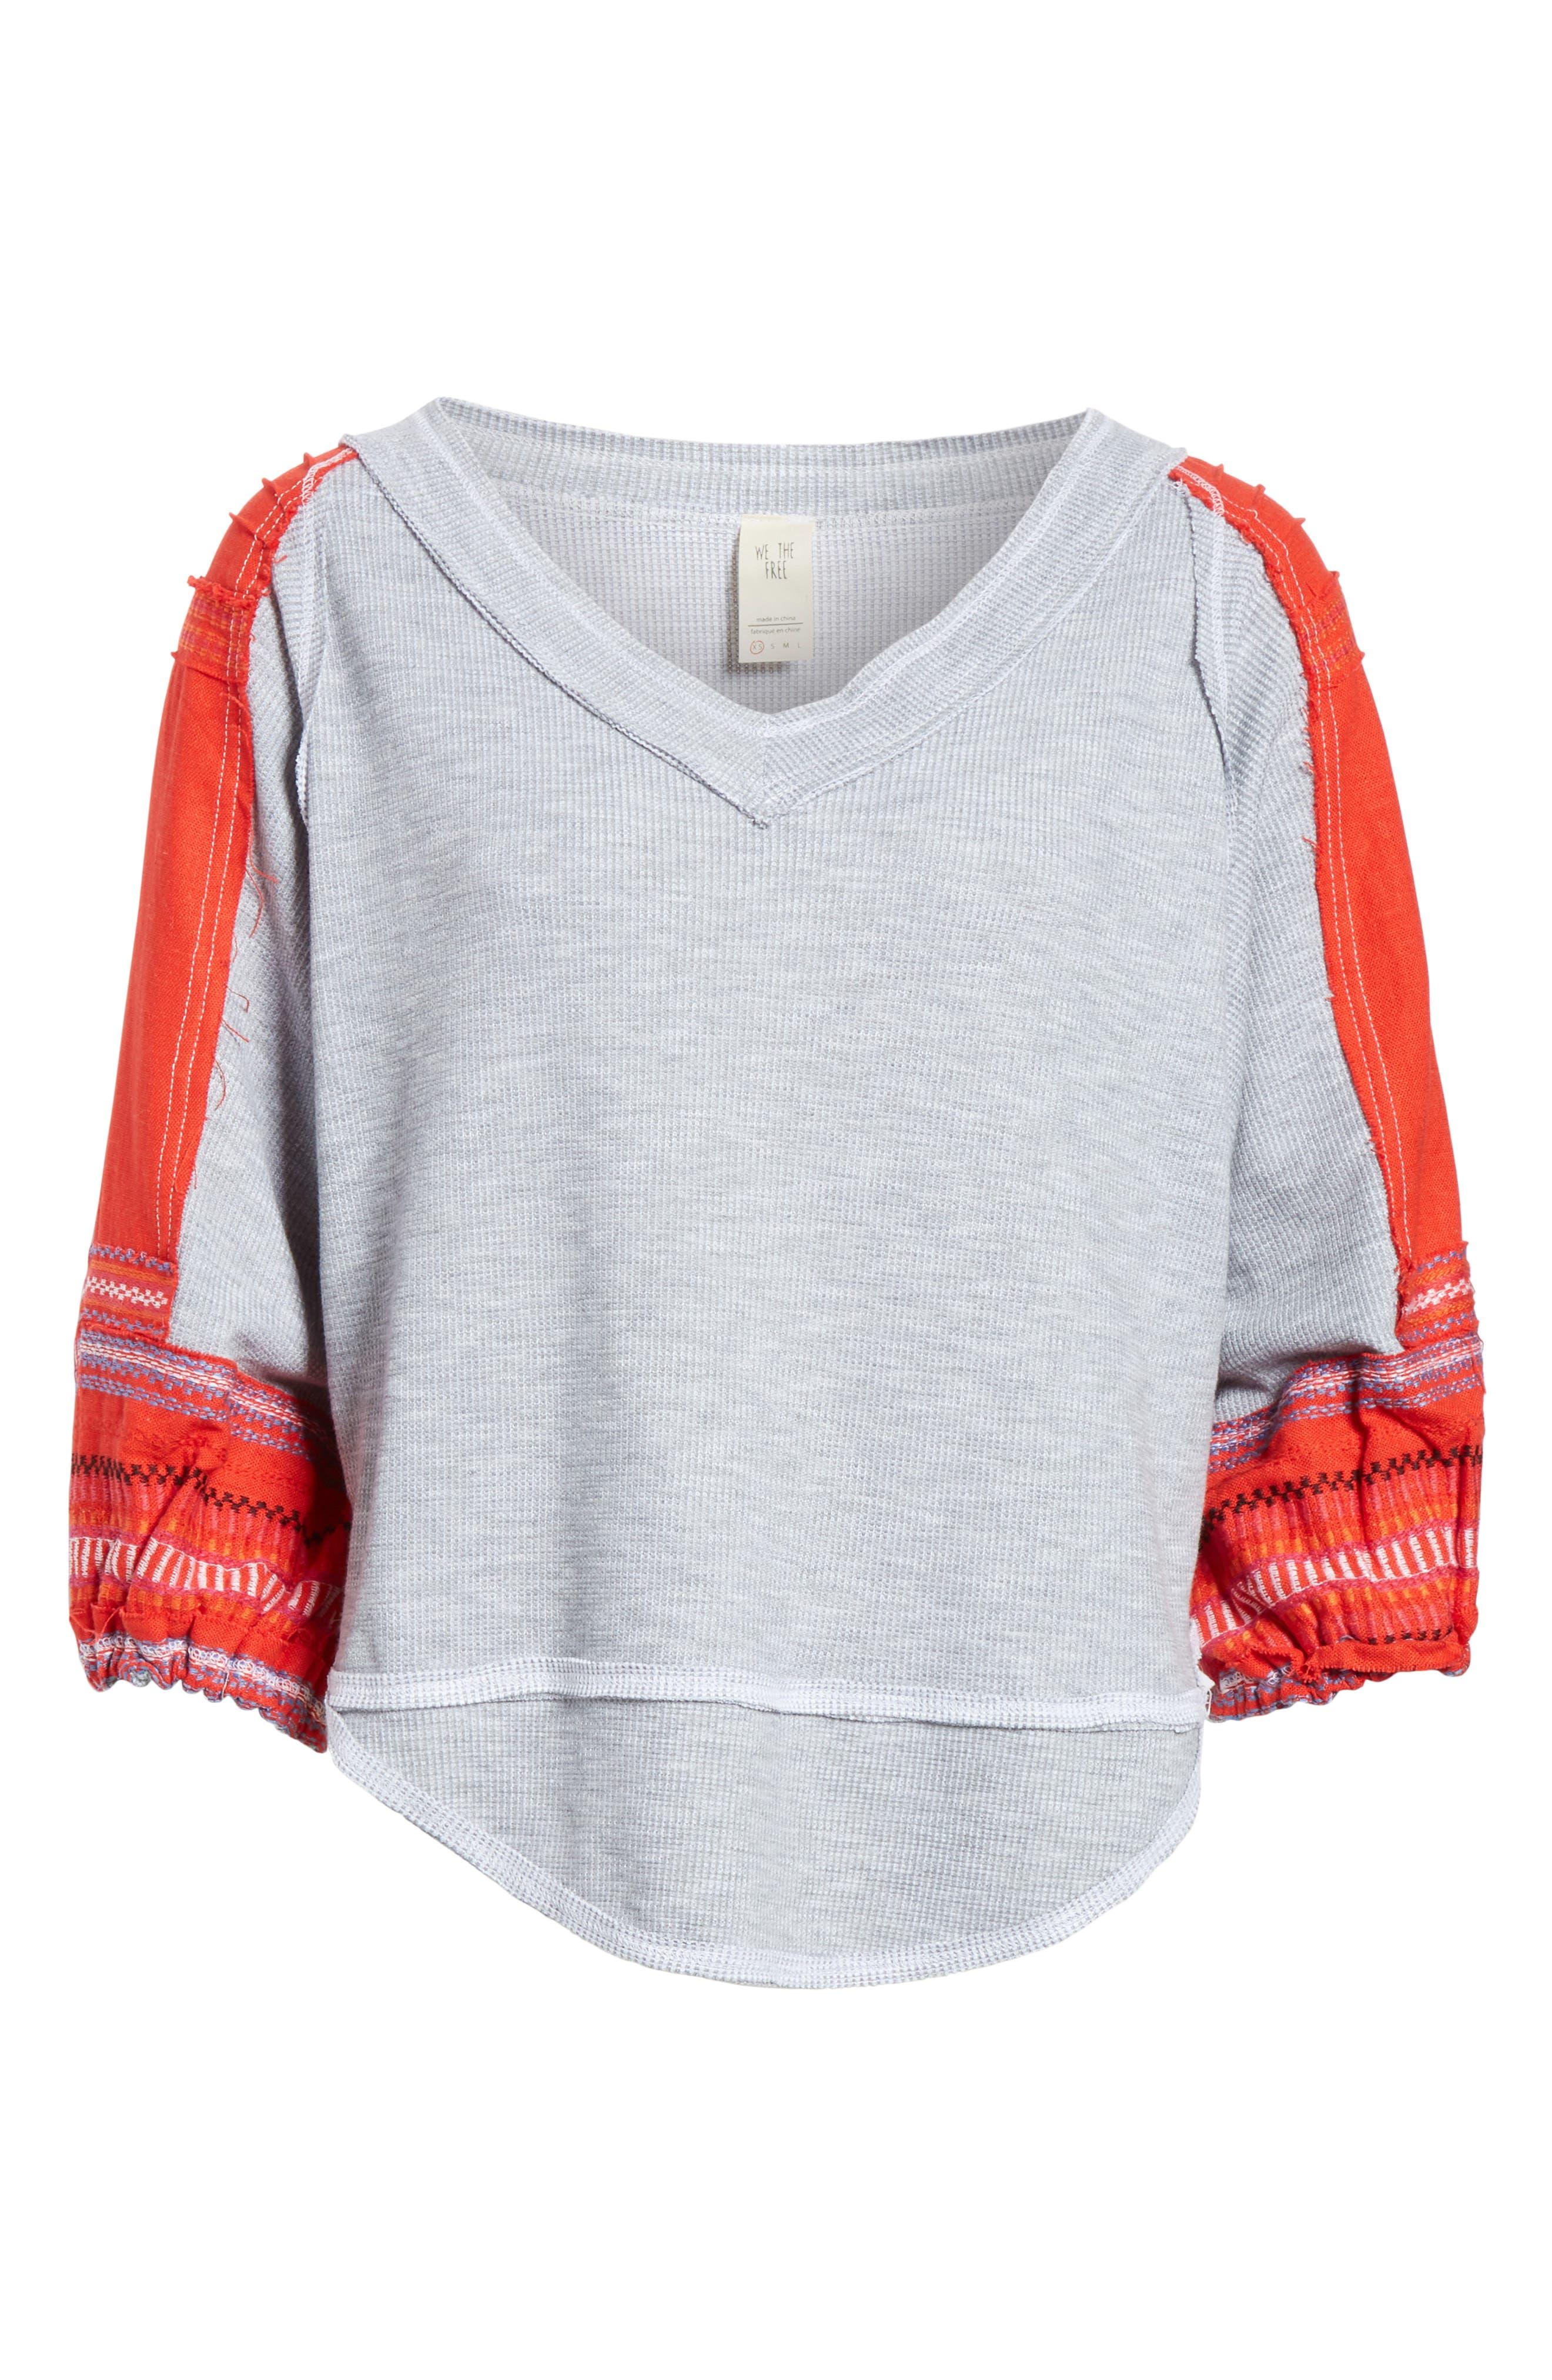 Bubble Shirt,                             Alternate thumbnail 6, color,                             Grey